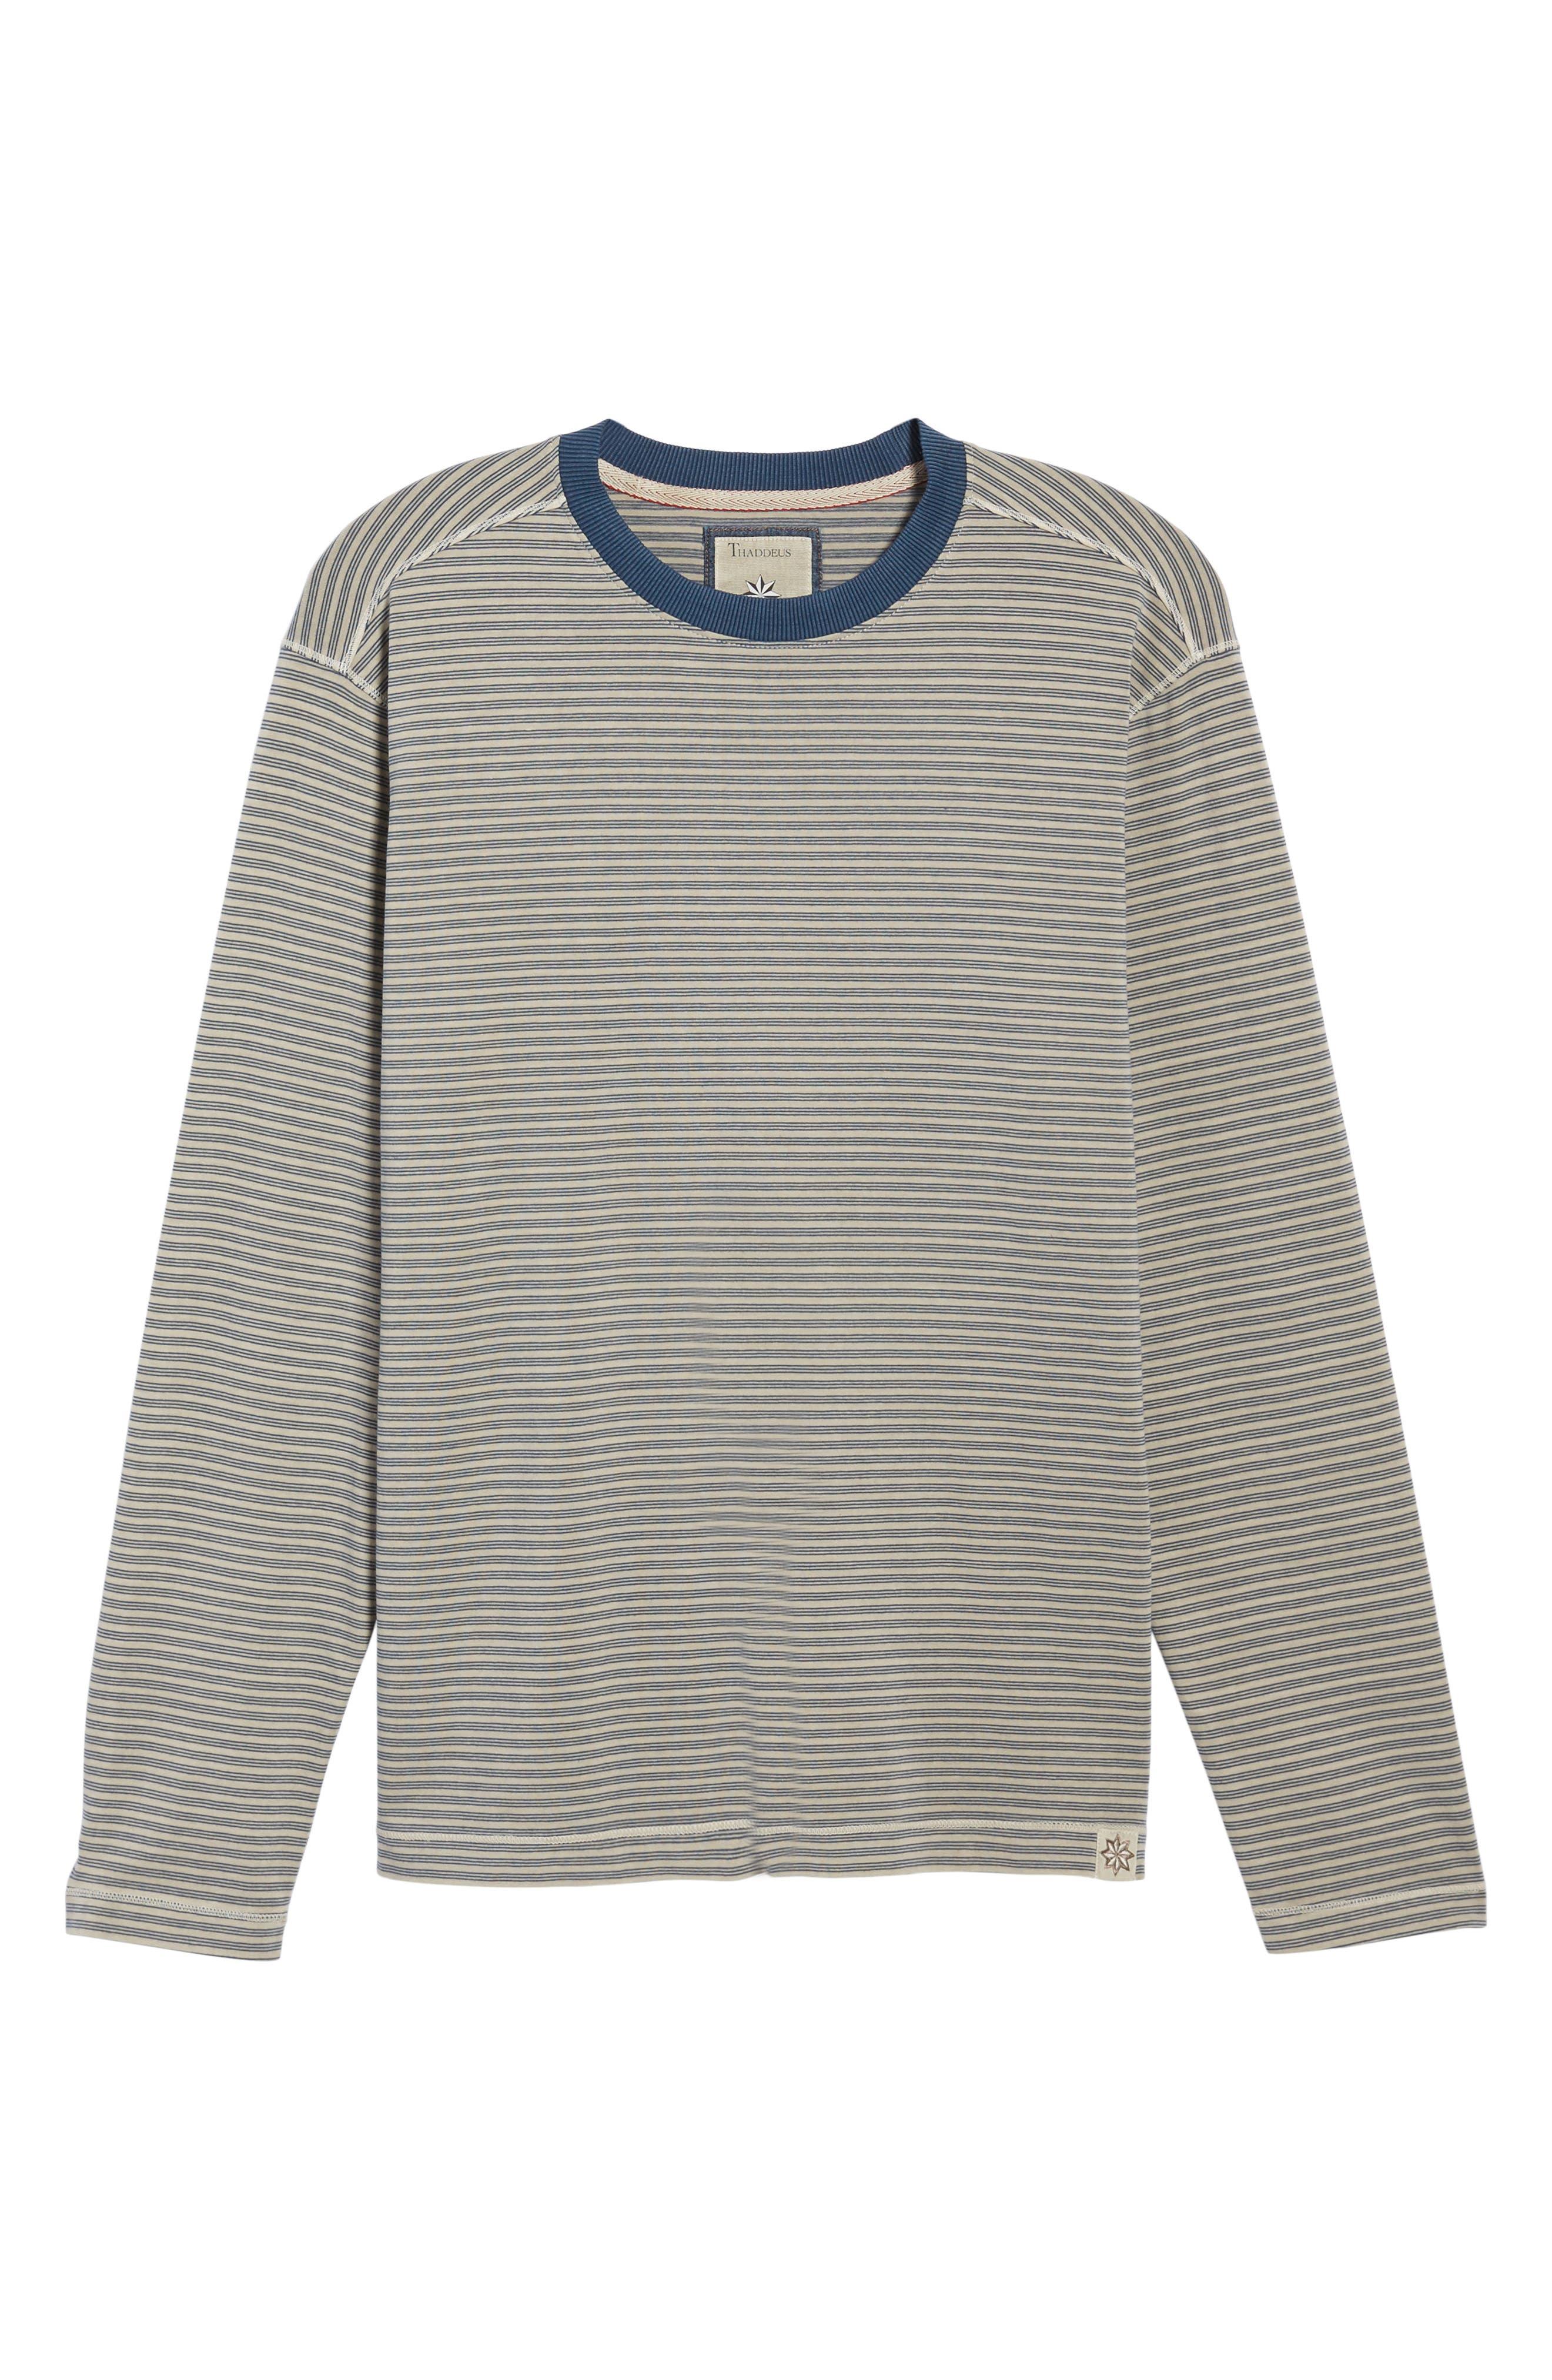 Iverson Long Sleeve Striped T-Shirt,                             Alternate thumbnail 6, color,                             290